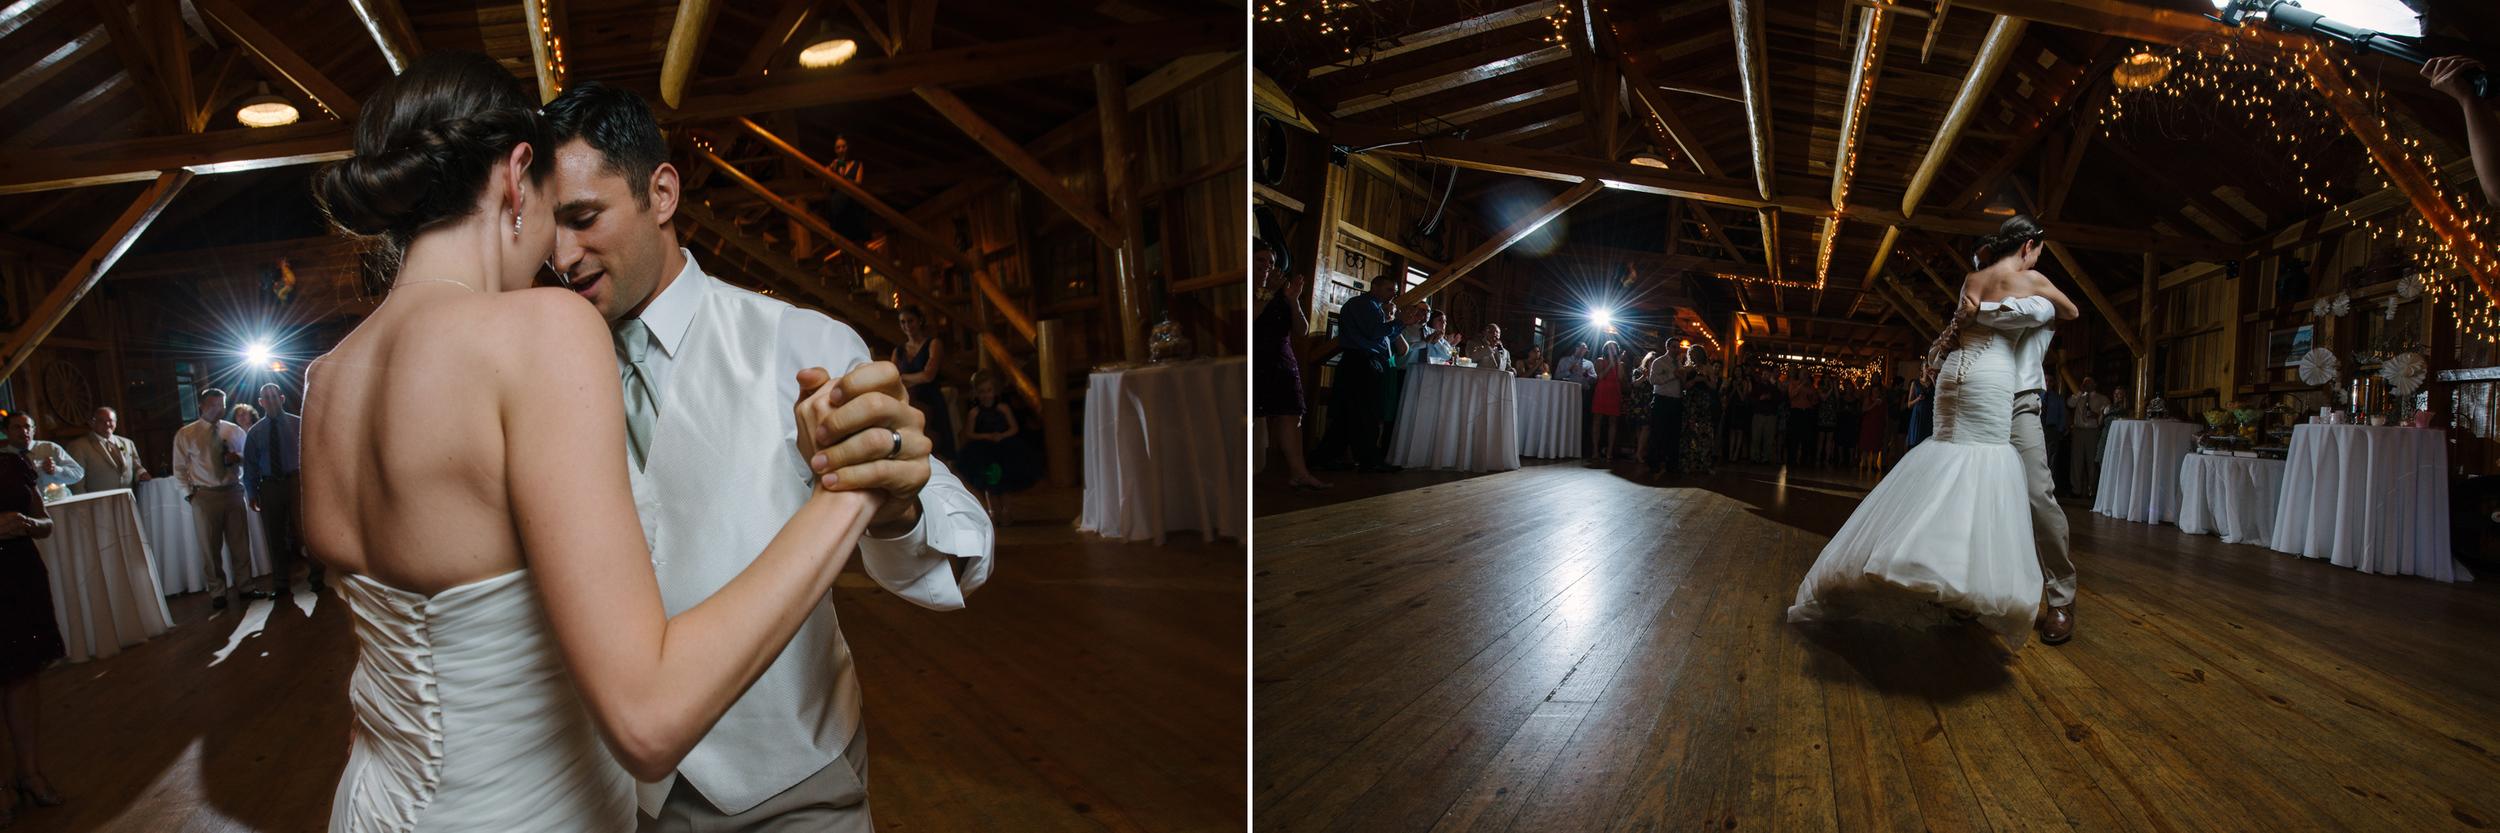 Matt_Swetel_Photography_Erin_and_Jeff_married047.jpg